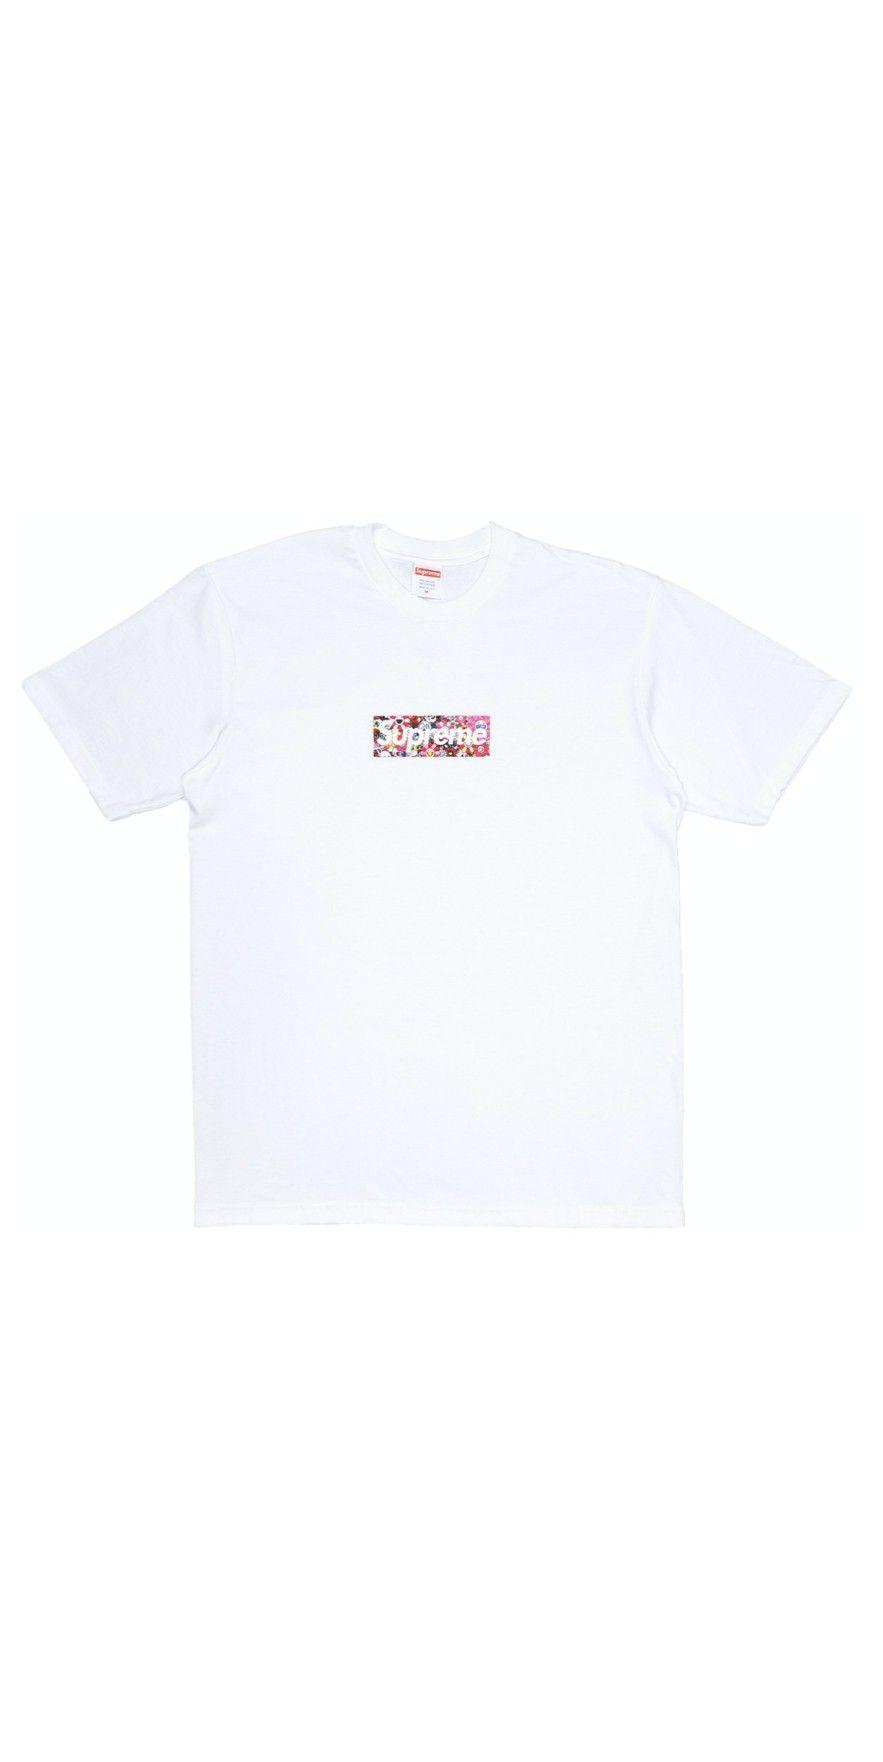 Supreme Takashi Murakami Relief Box Logo